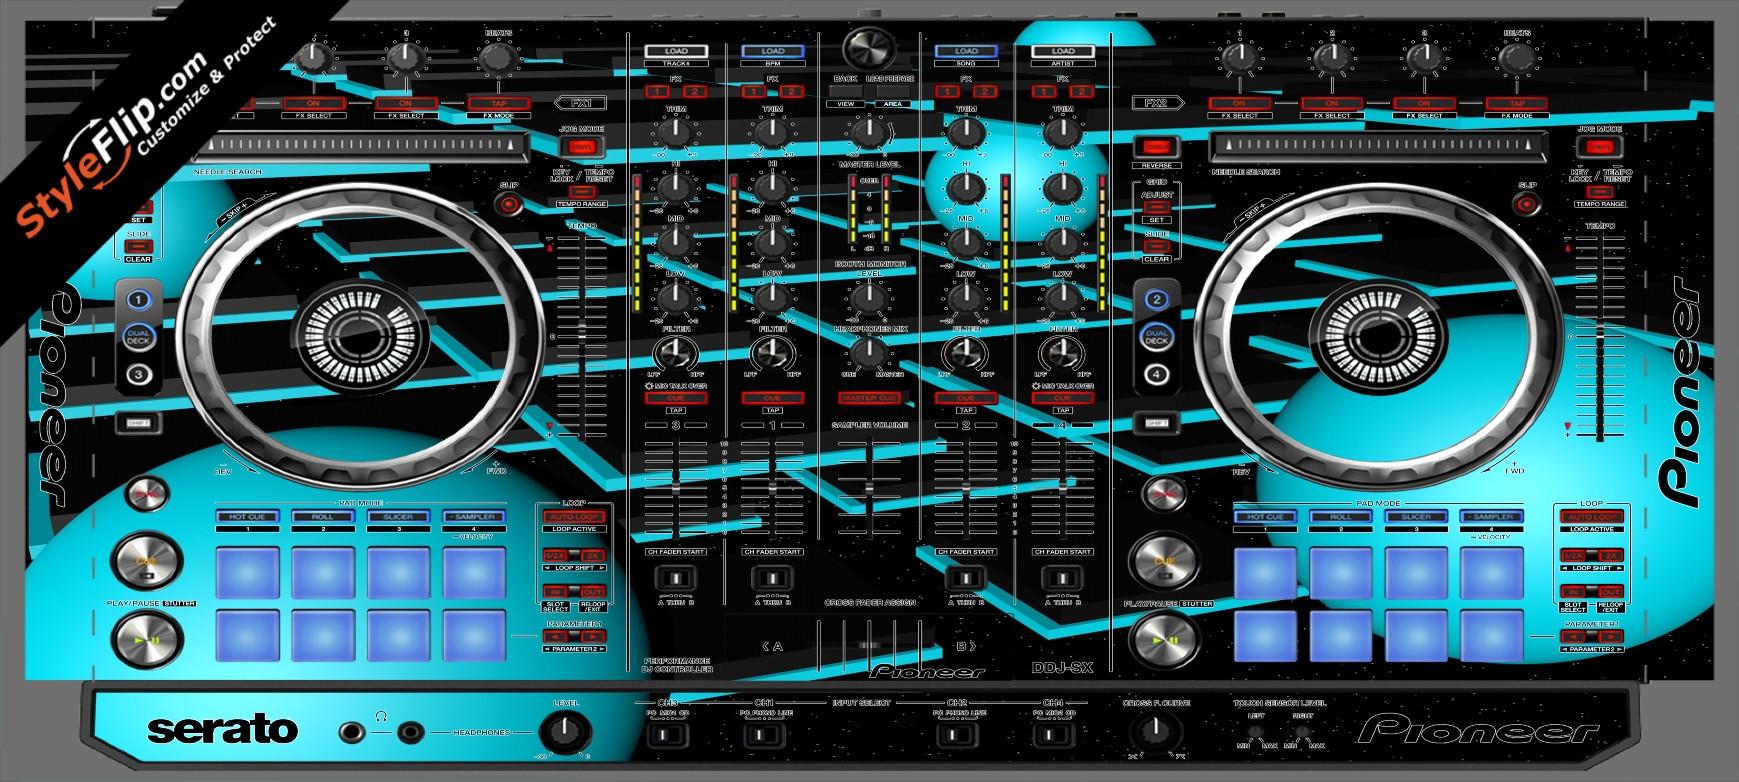 Tron Pioneer DDJ-SX